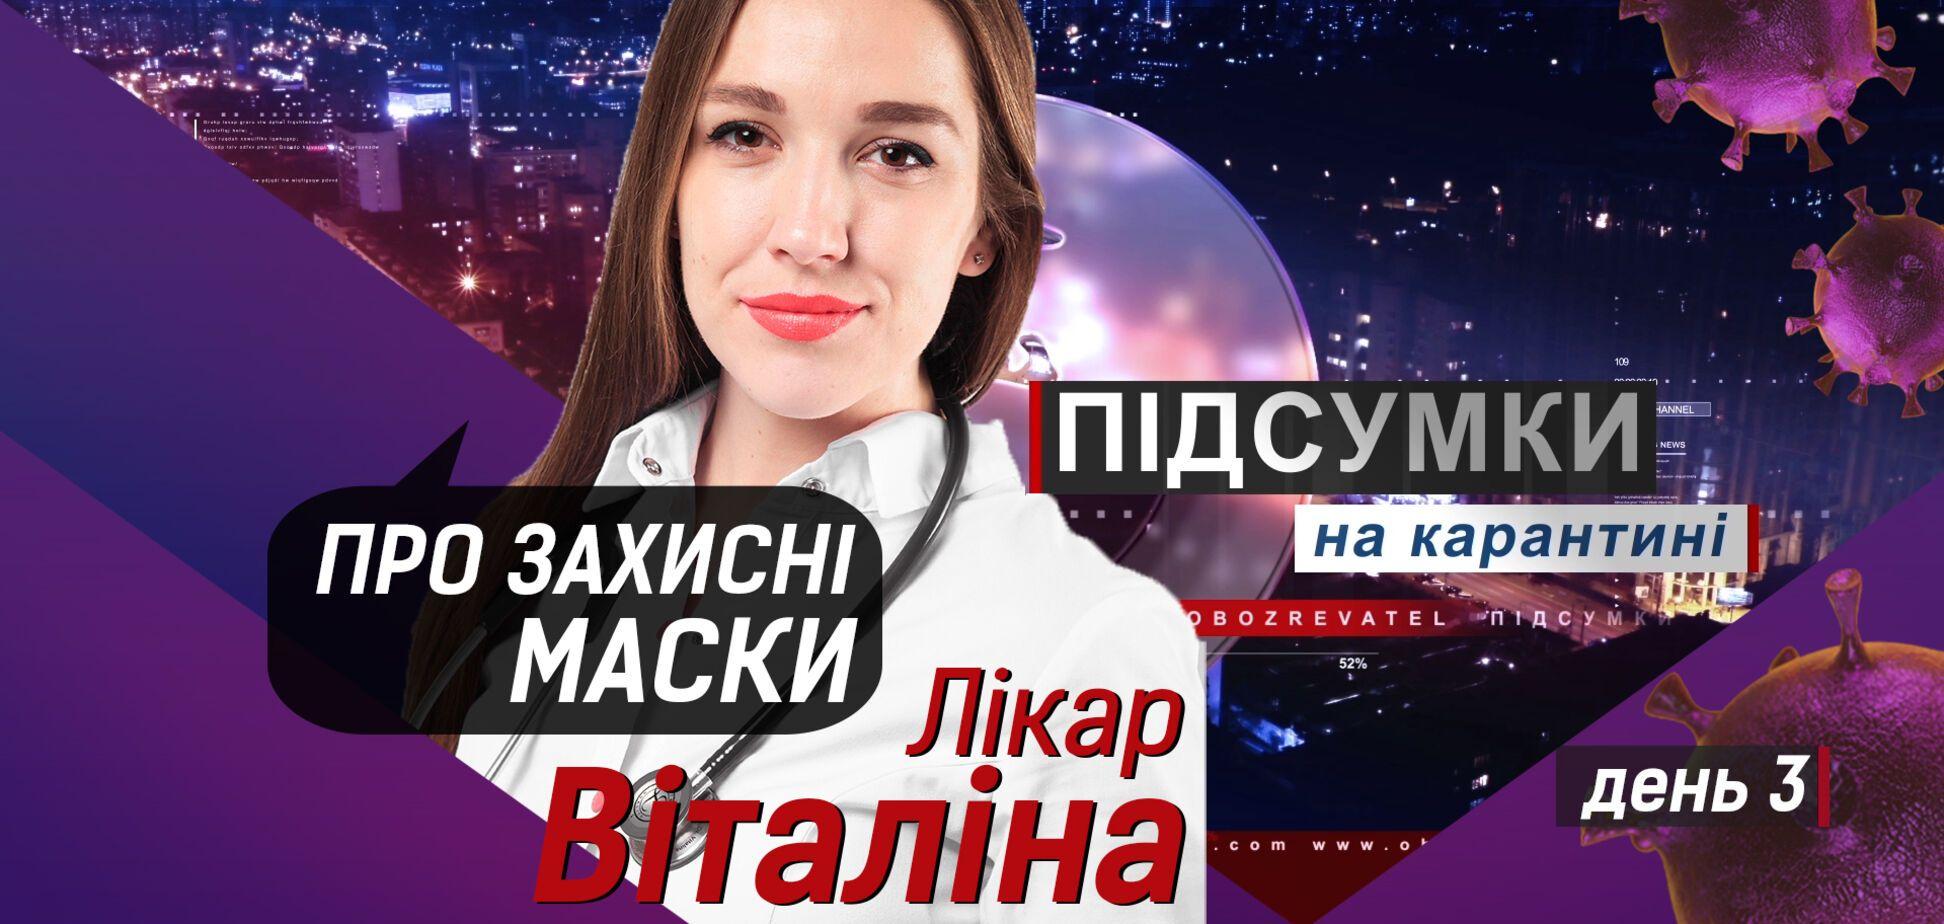 Коронавирус в Украине: защитит ли маска